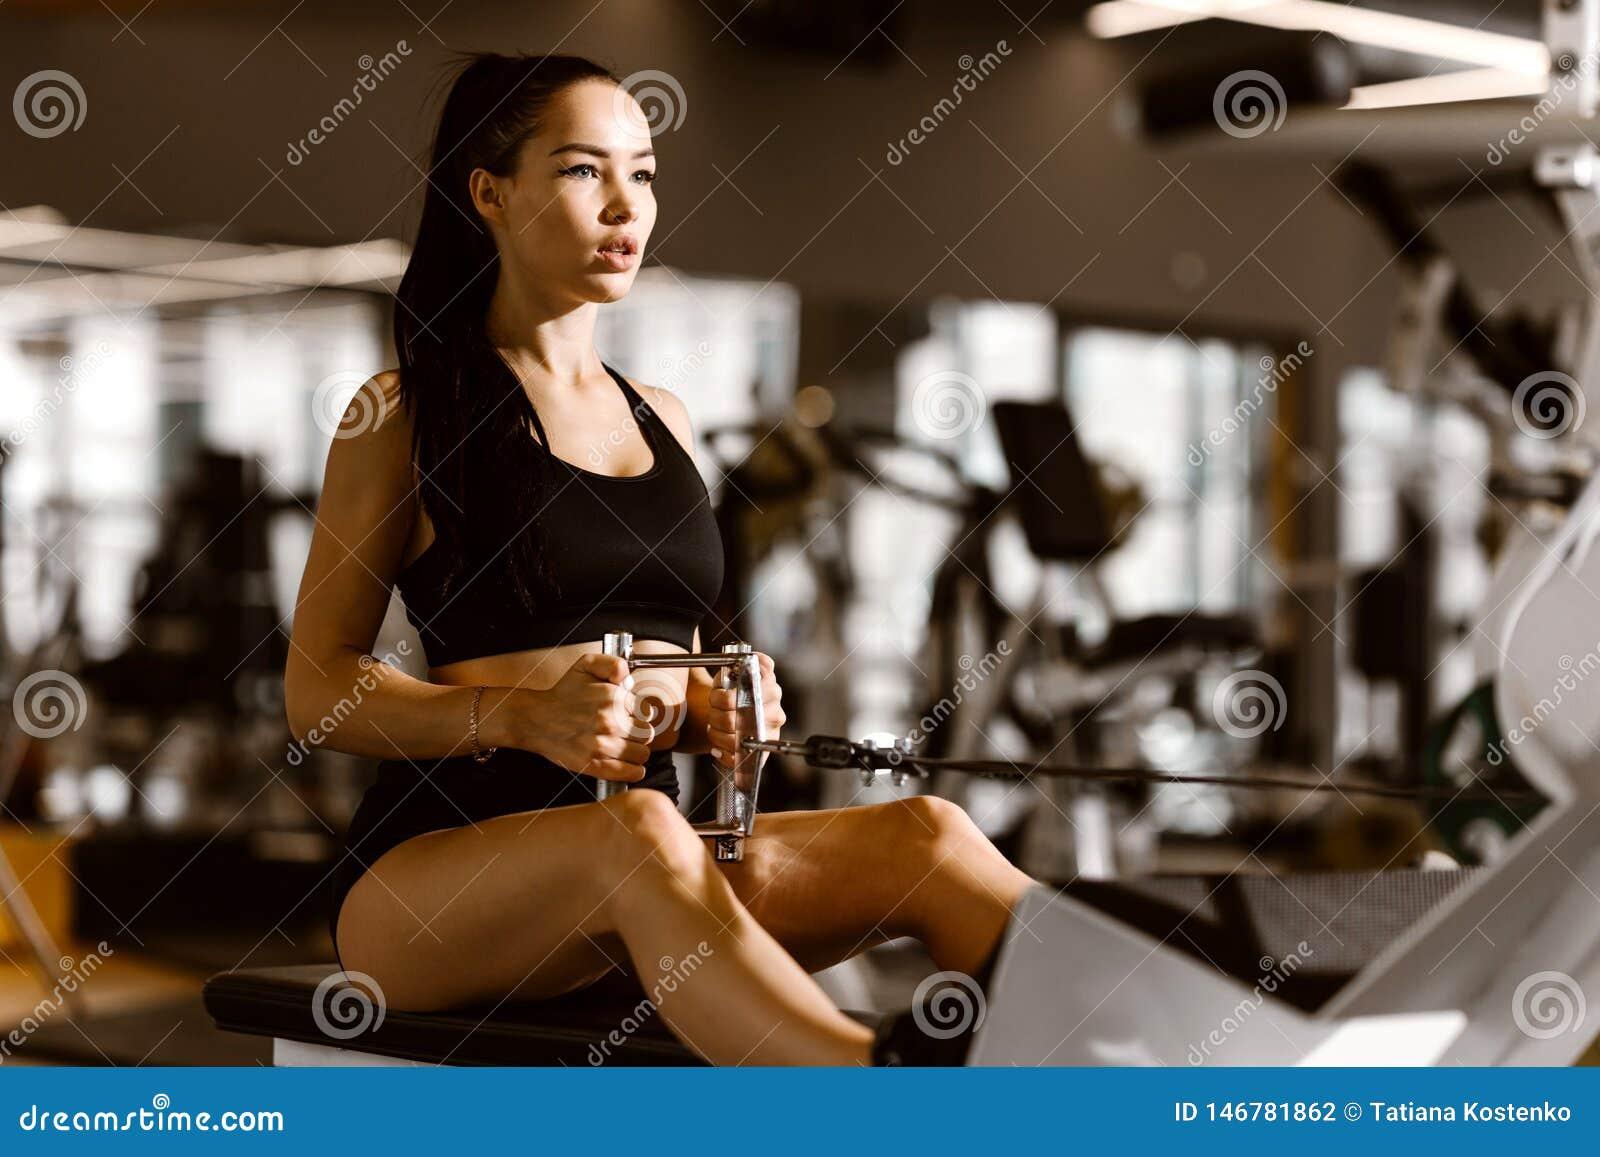 Het jonge slanke donker-haired meisje gekleed in zwarte sportenbovenkant en borrels werkt op de oefeningsmachine uit in de gymnas